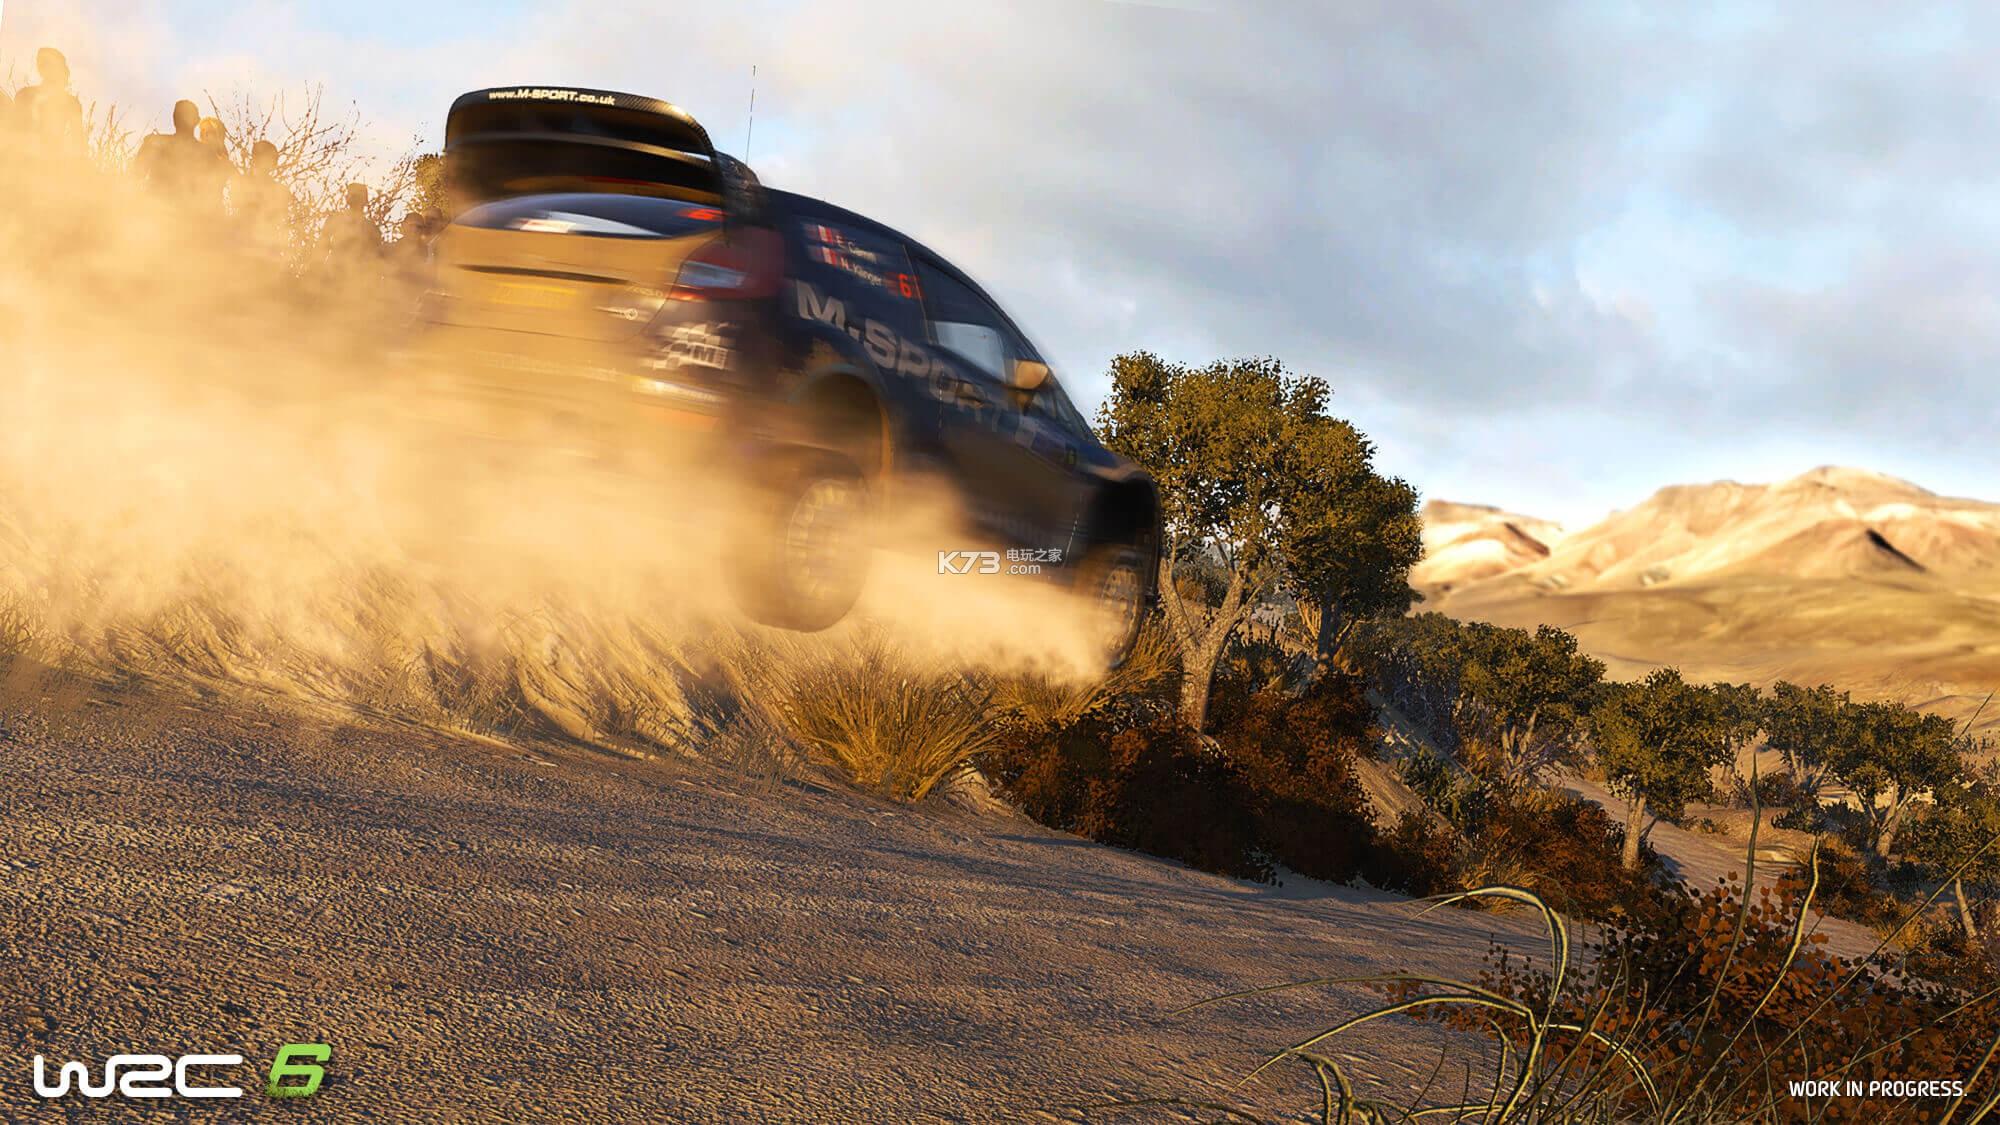 WRC世界汽车拉力锦标赛6 汉化硬盘版下载 截图